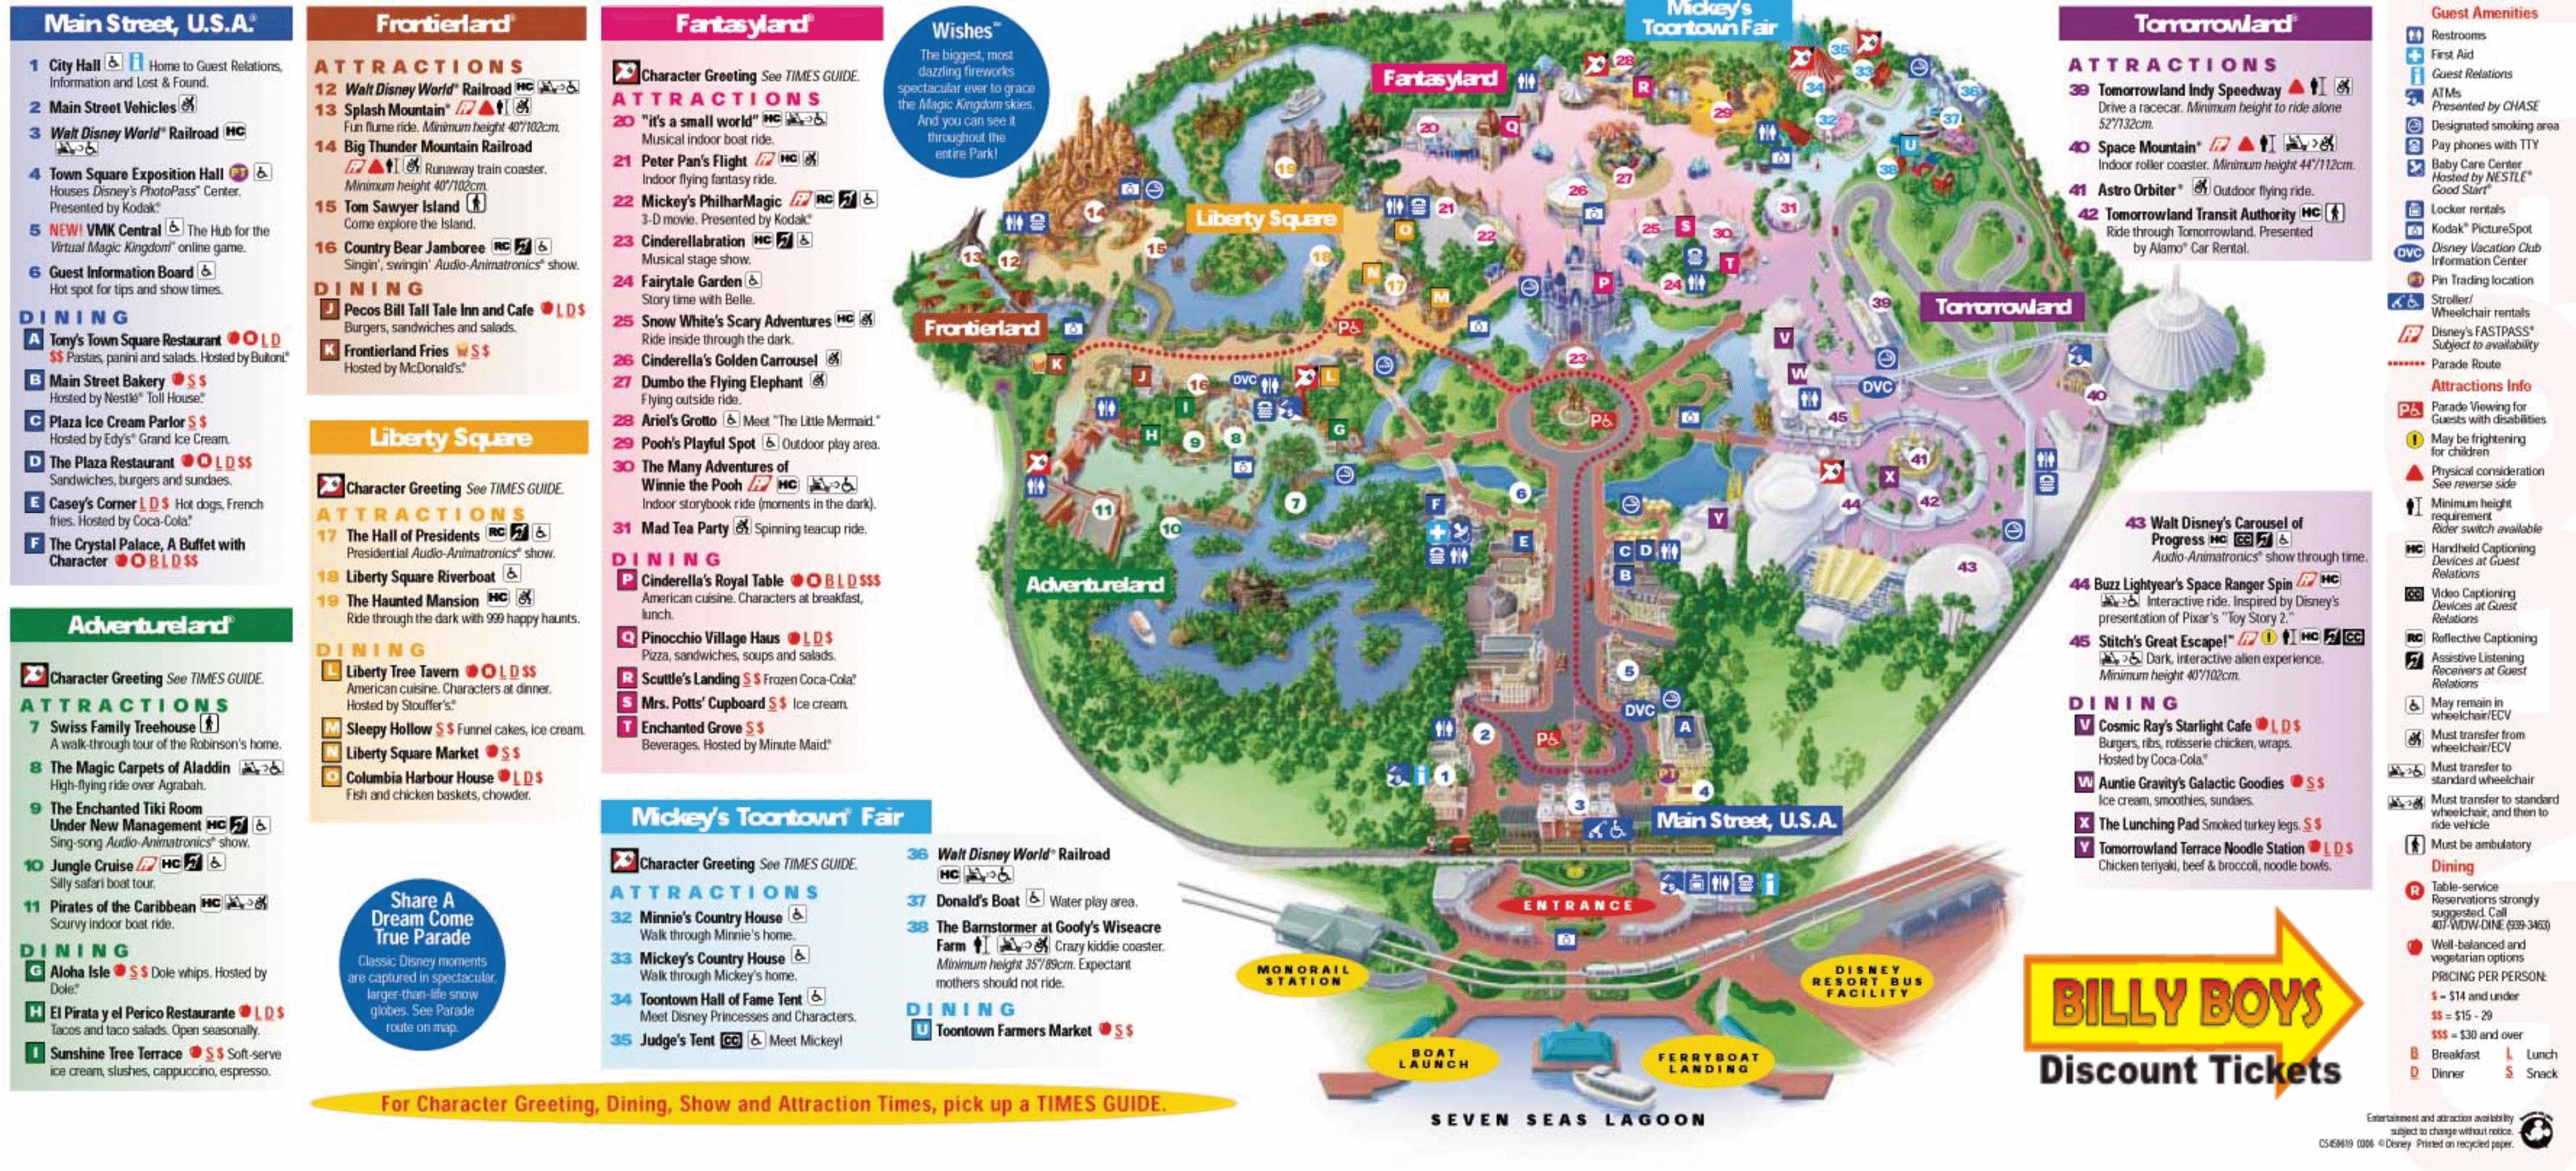 Awesome Printable Disney World Maps 1 - Link-Italia - Printable Disney Maps